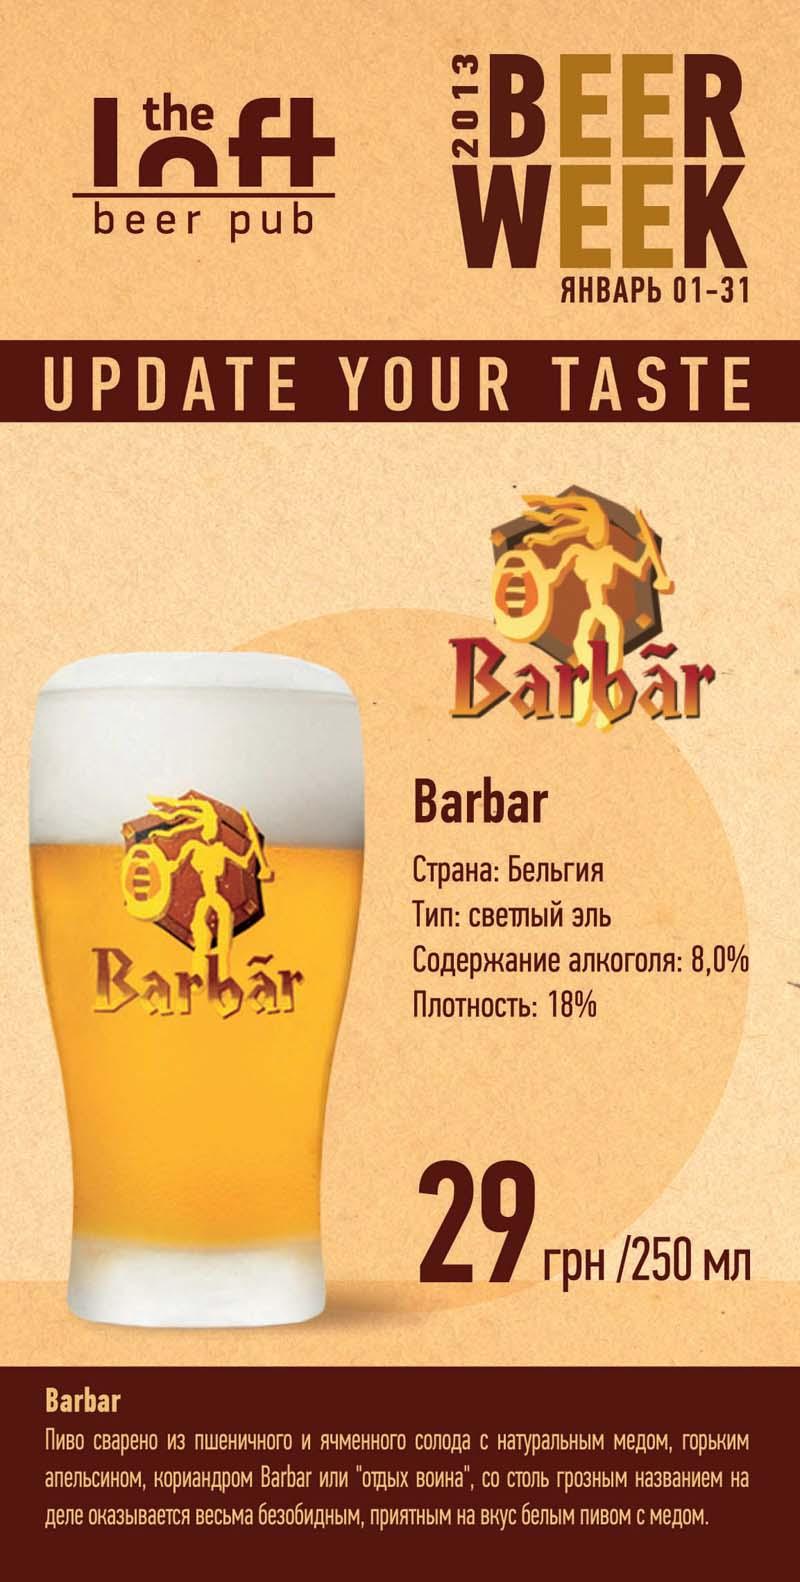 Пиво Barbar за 29 грн. в Loft